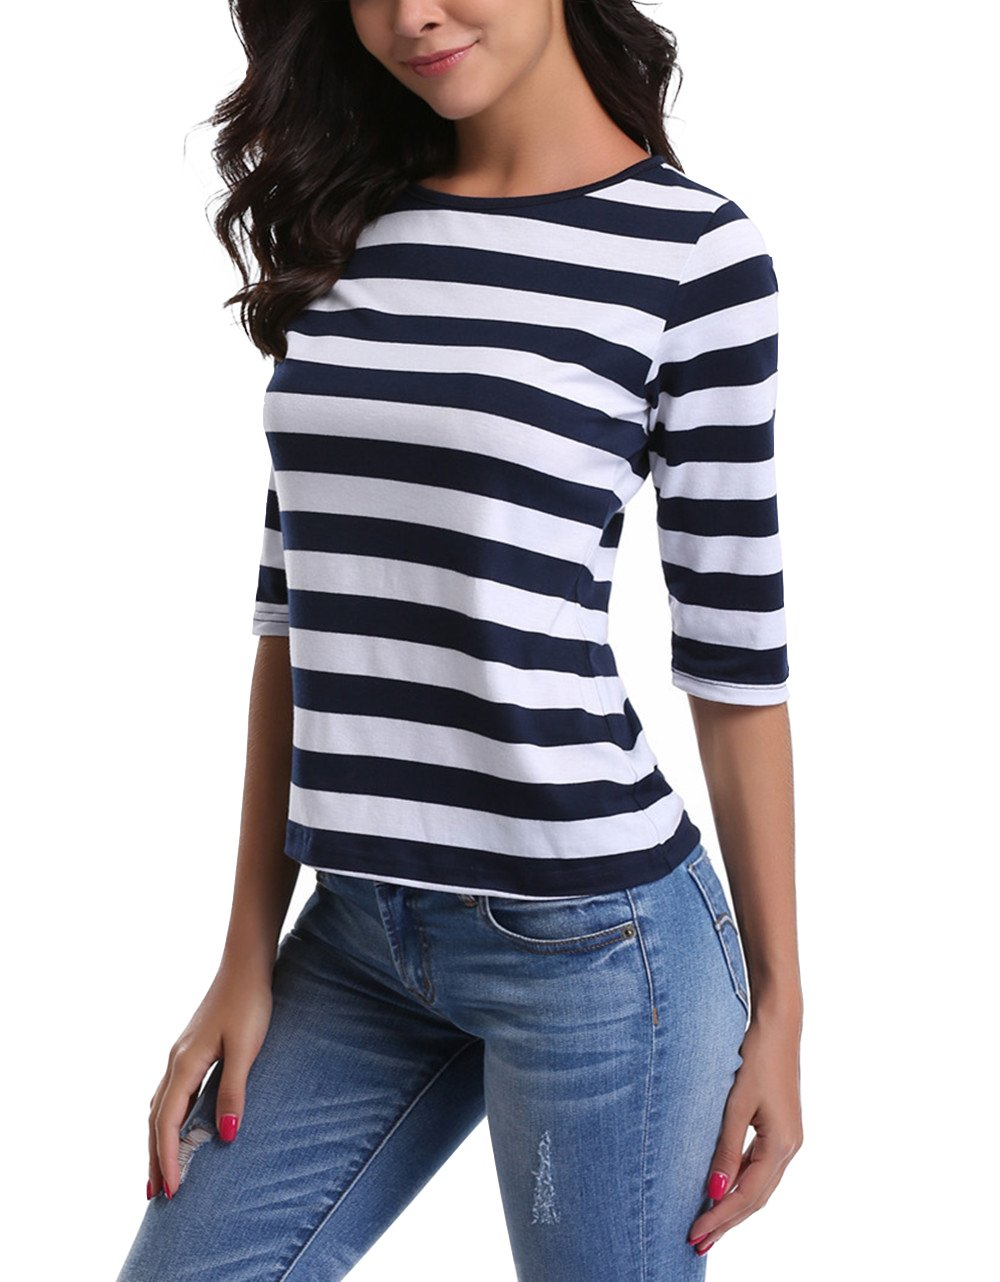 MISS MOLY SHIRT レディース B0756TNRC2 S|Dark Blue Medium Stripe Dark Blue Medium Stripe S